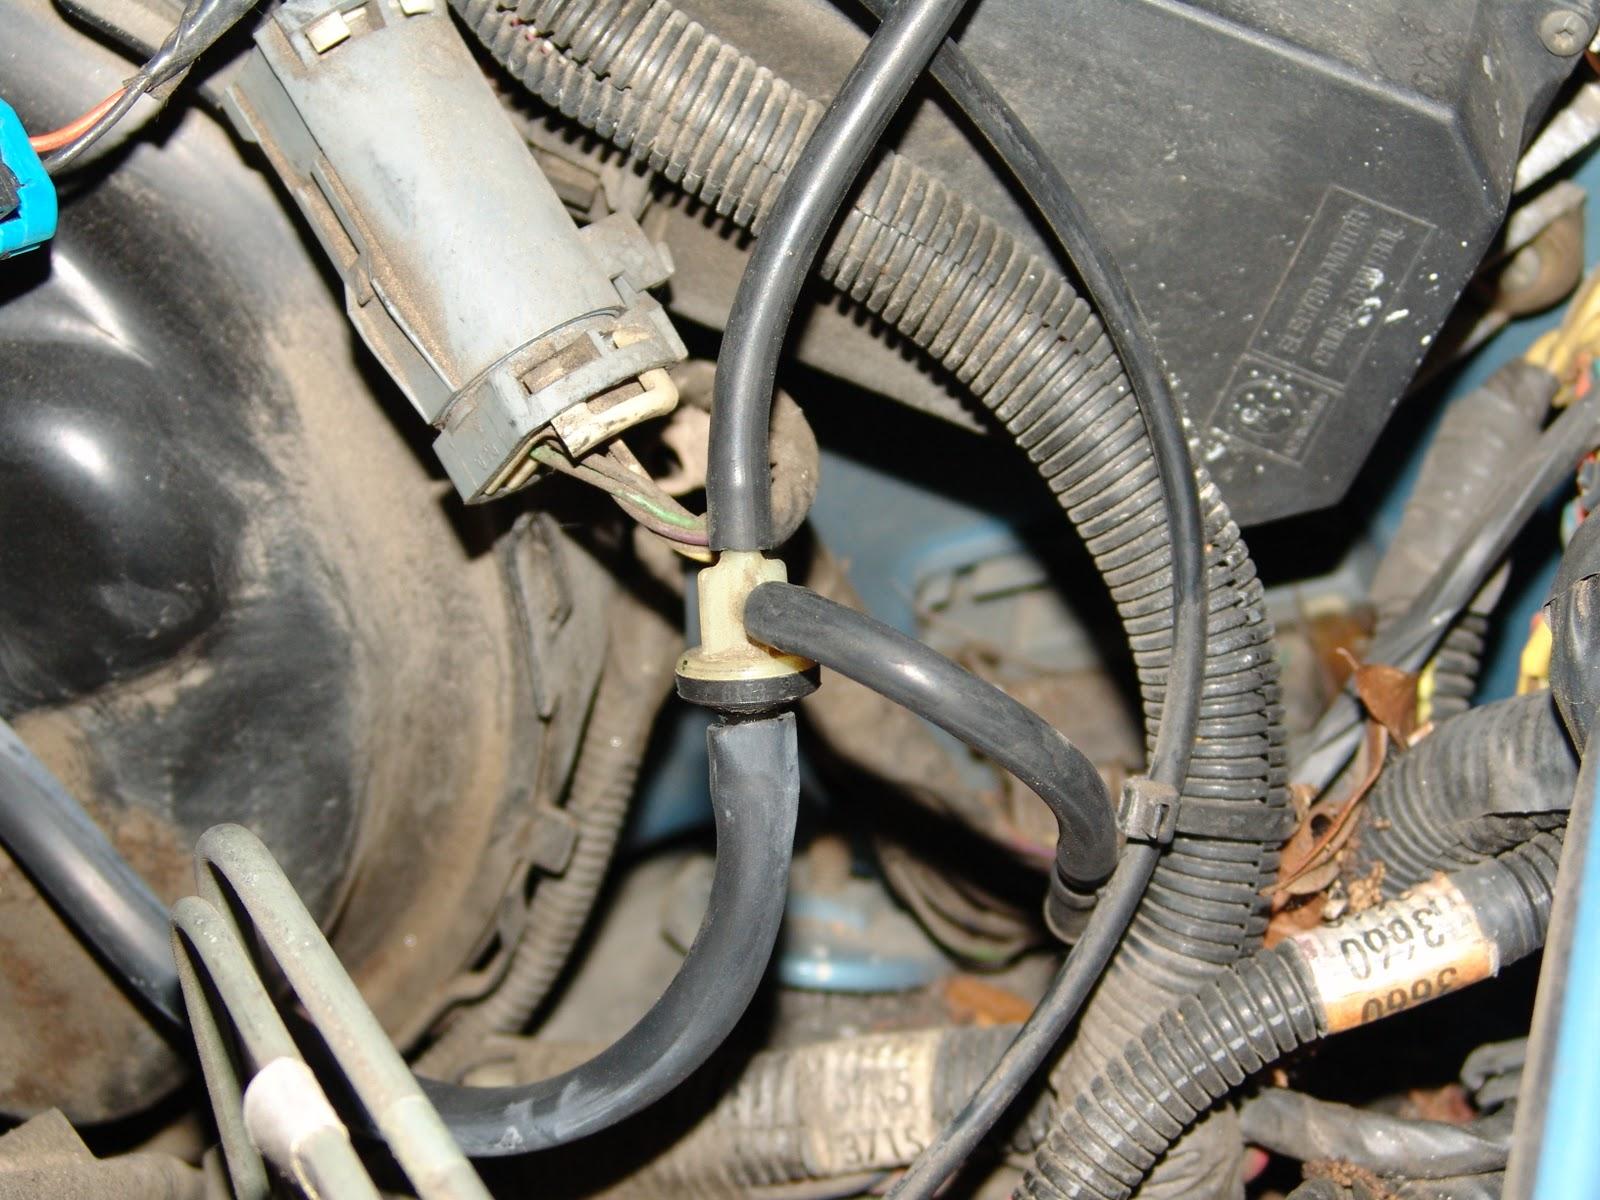 medium resolution of 2003 chevy astro van fuse box 1998 chevy astro van wiring diagrams chevy astro van 1995